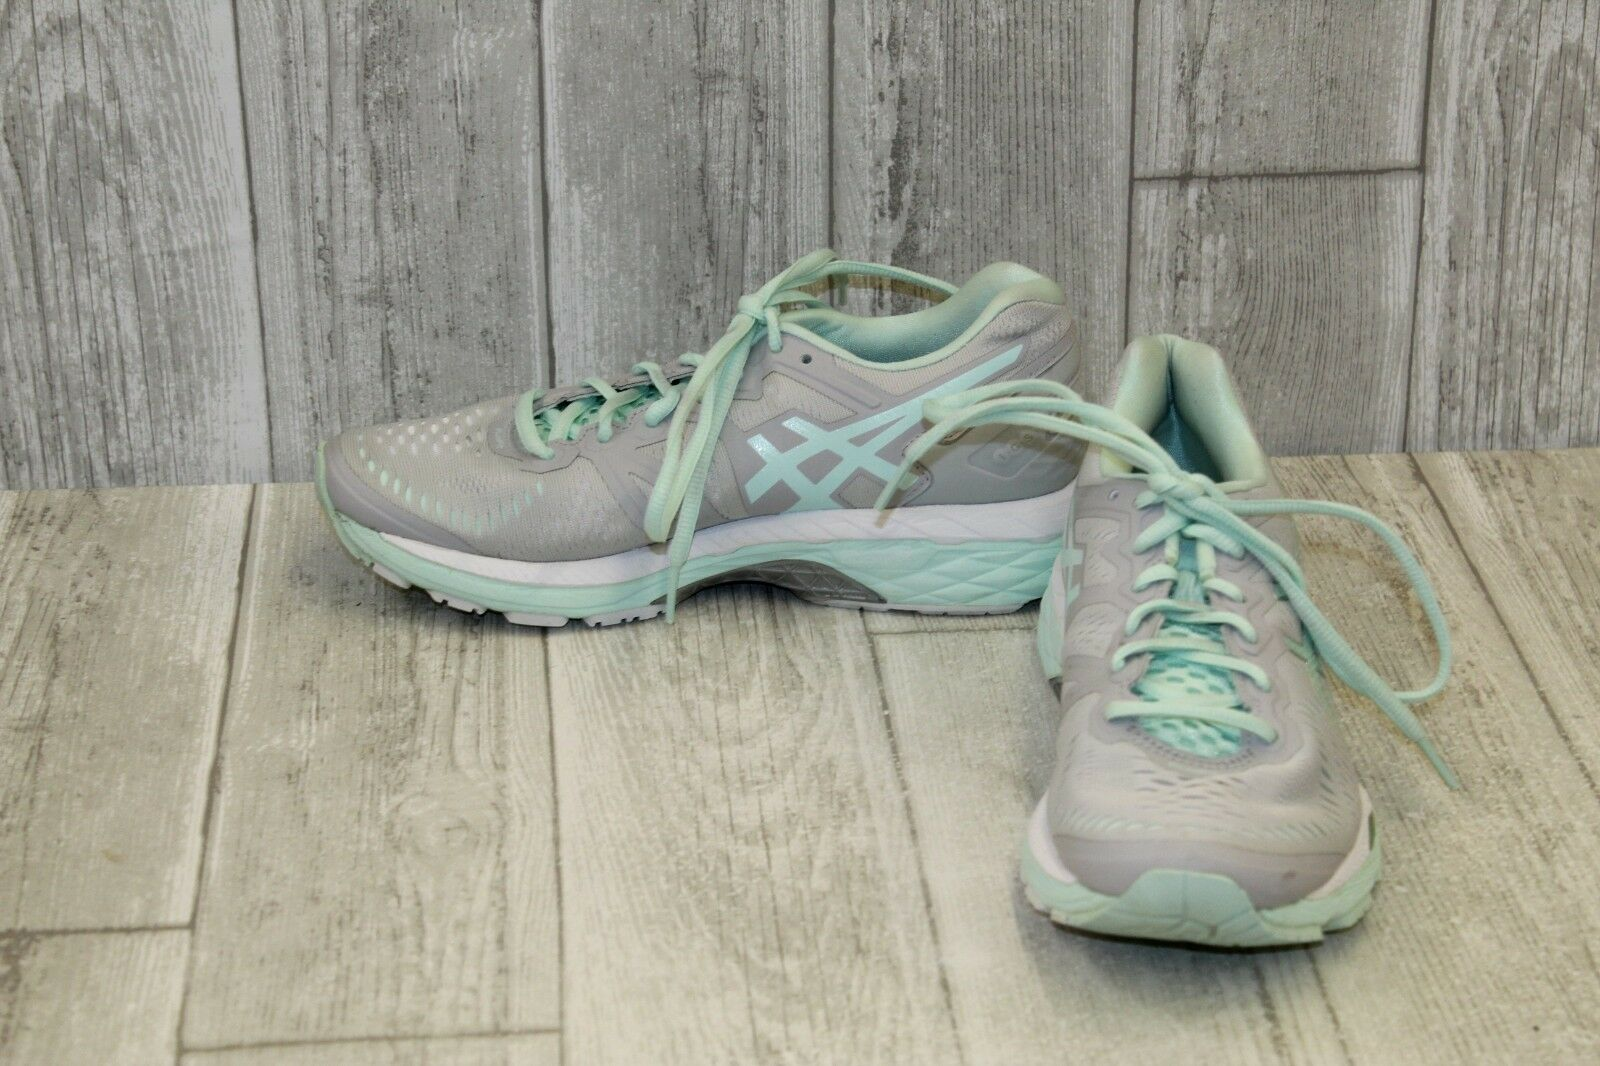 Asics Gel-Kayano 23 Zapatillas-Para Mujer Talla 7, gris Espuma Espuma Espuma mar  solo para ti